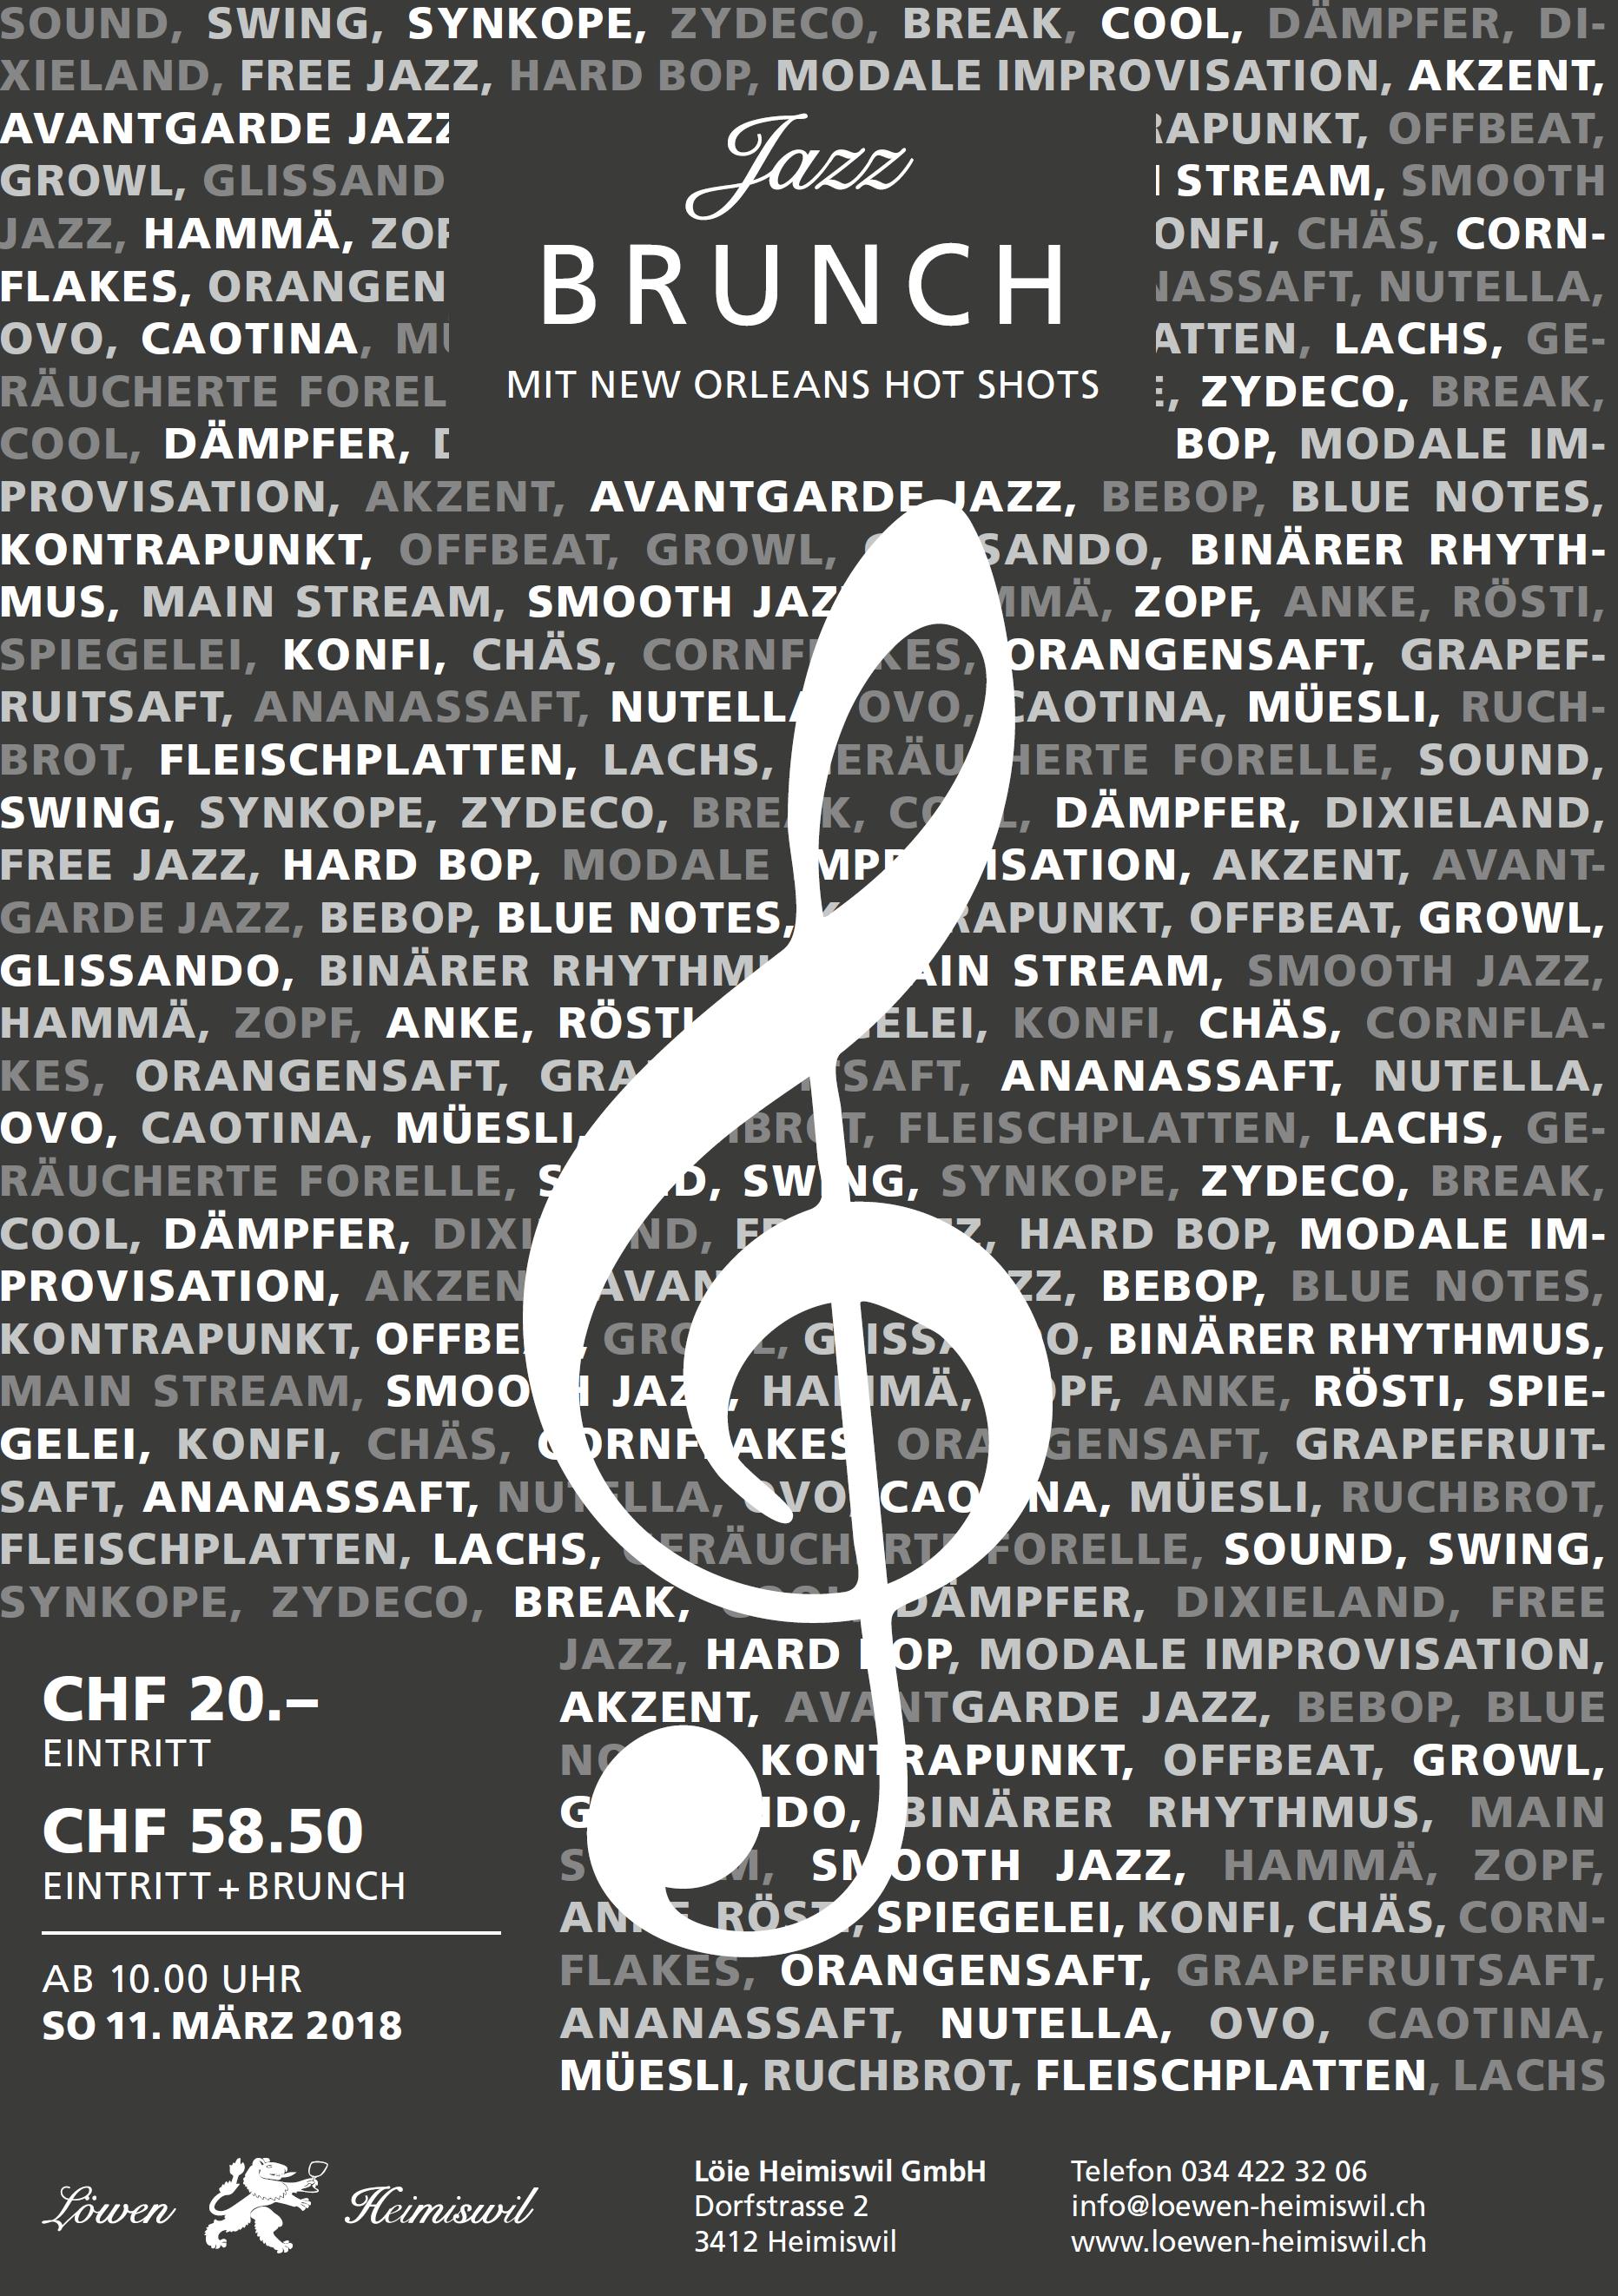 jazz-brunch-heimiswil